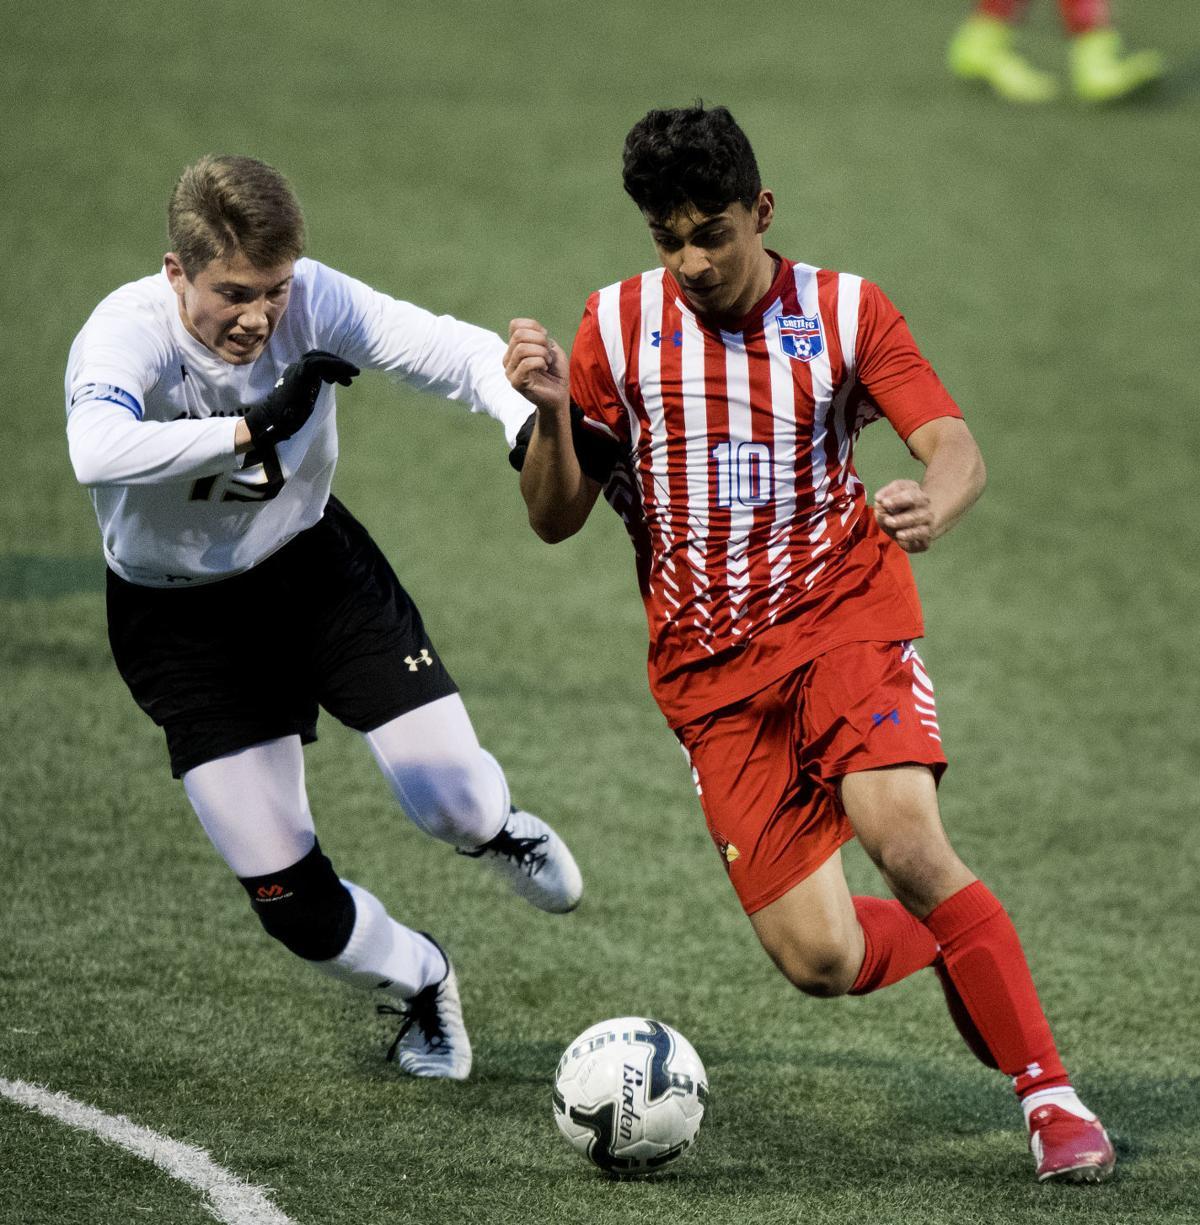 State soccer: Crete vs. Northwest, 5.8